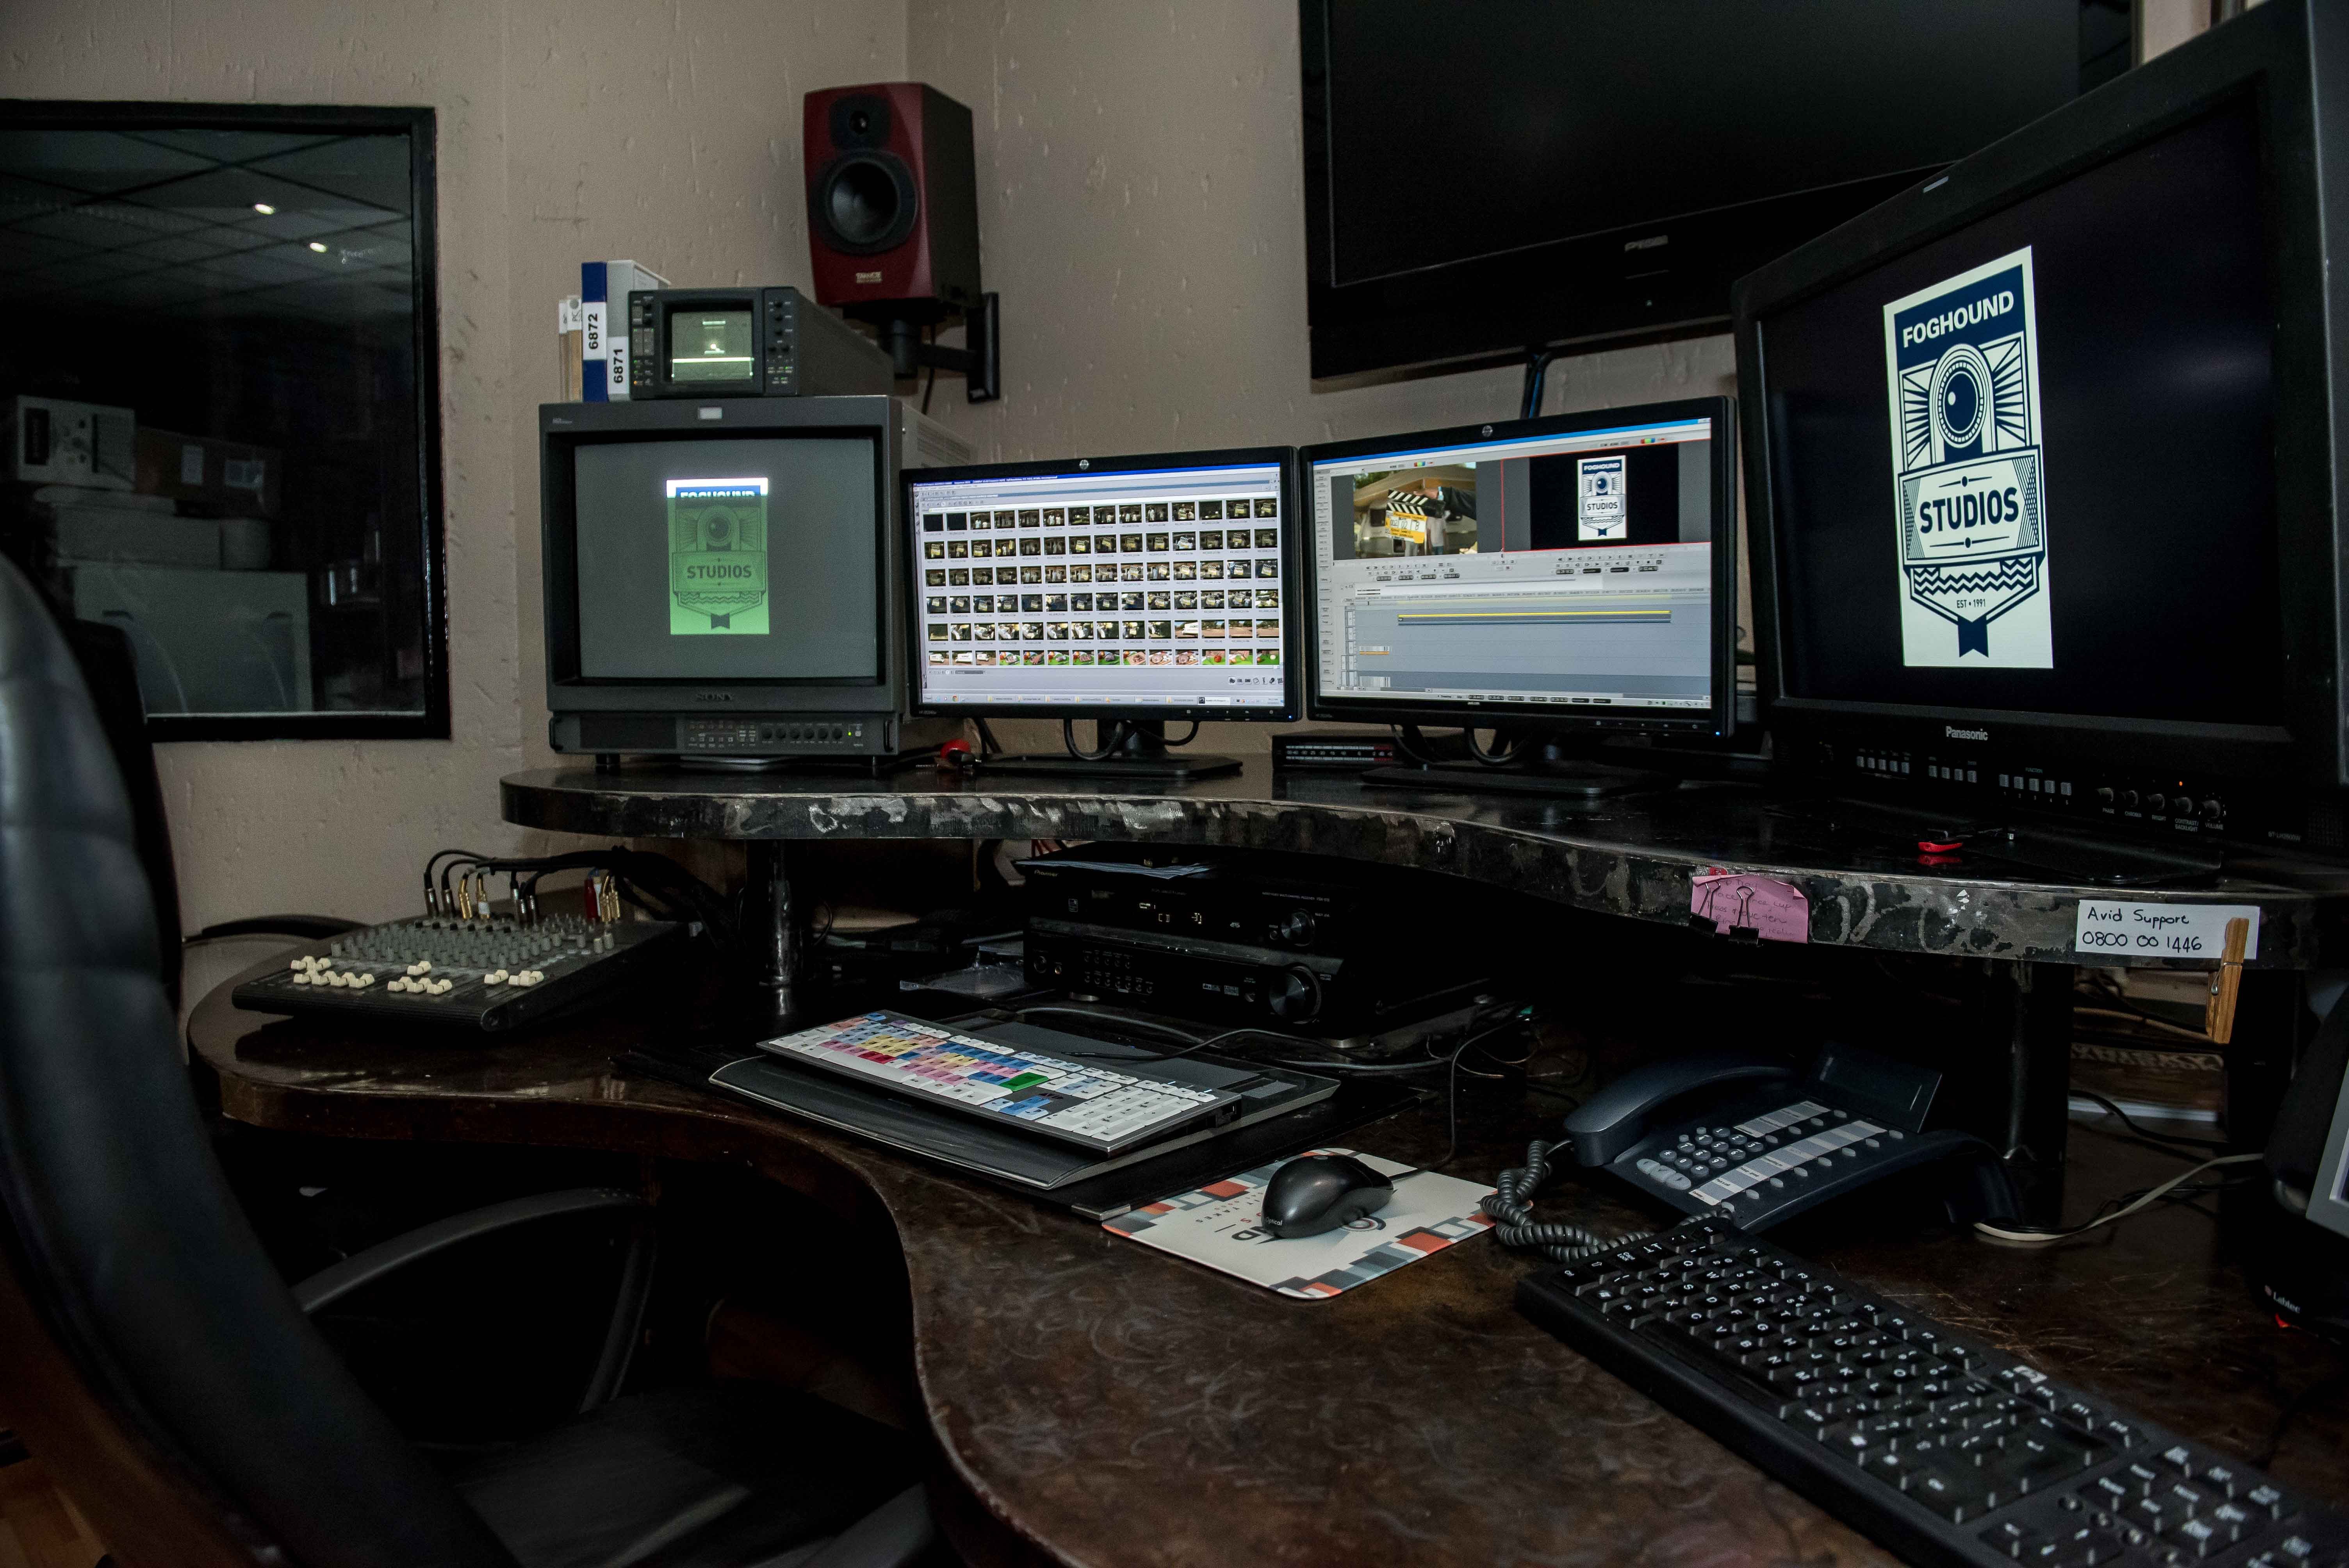 Foghound_Studios-28